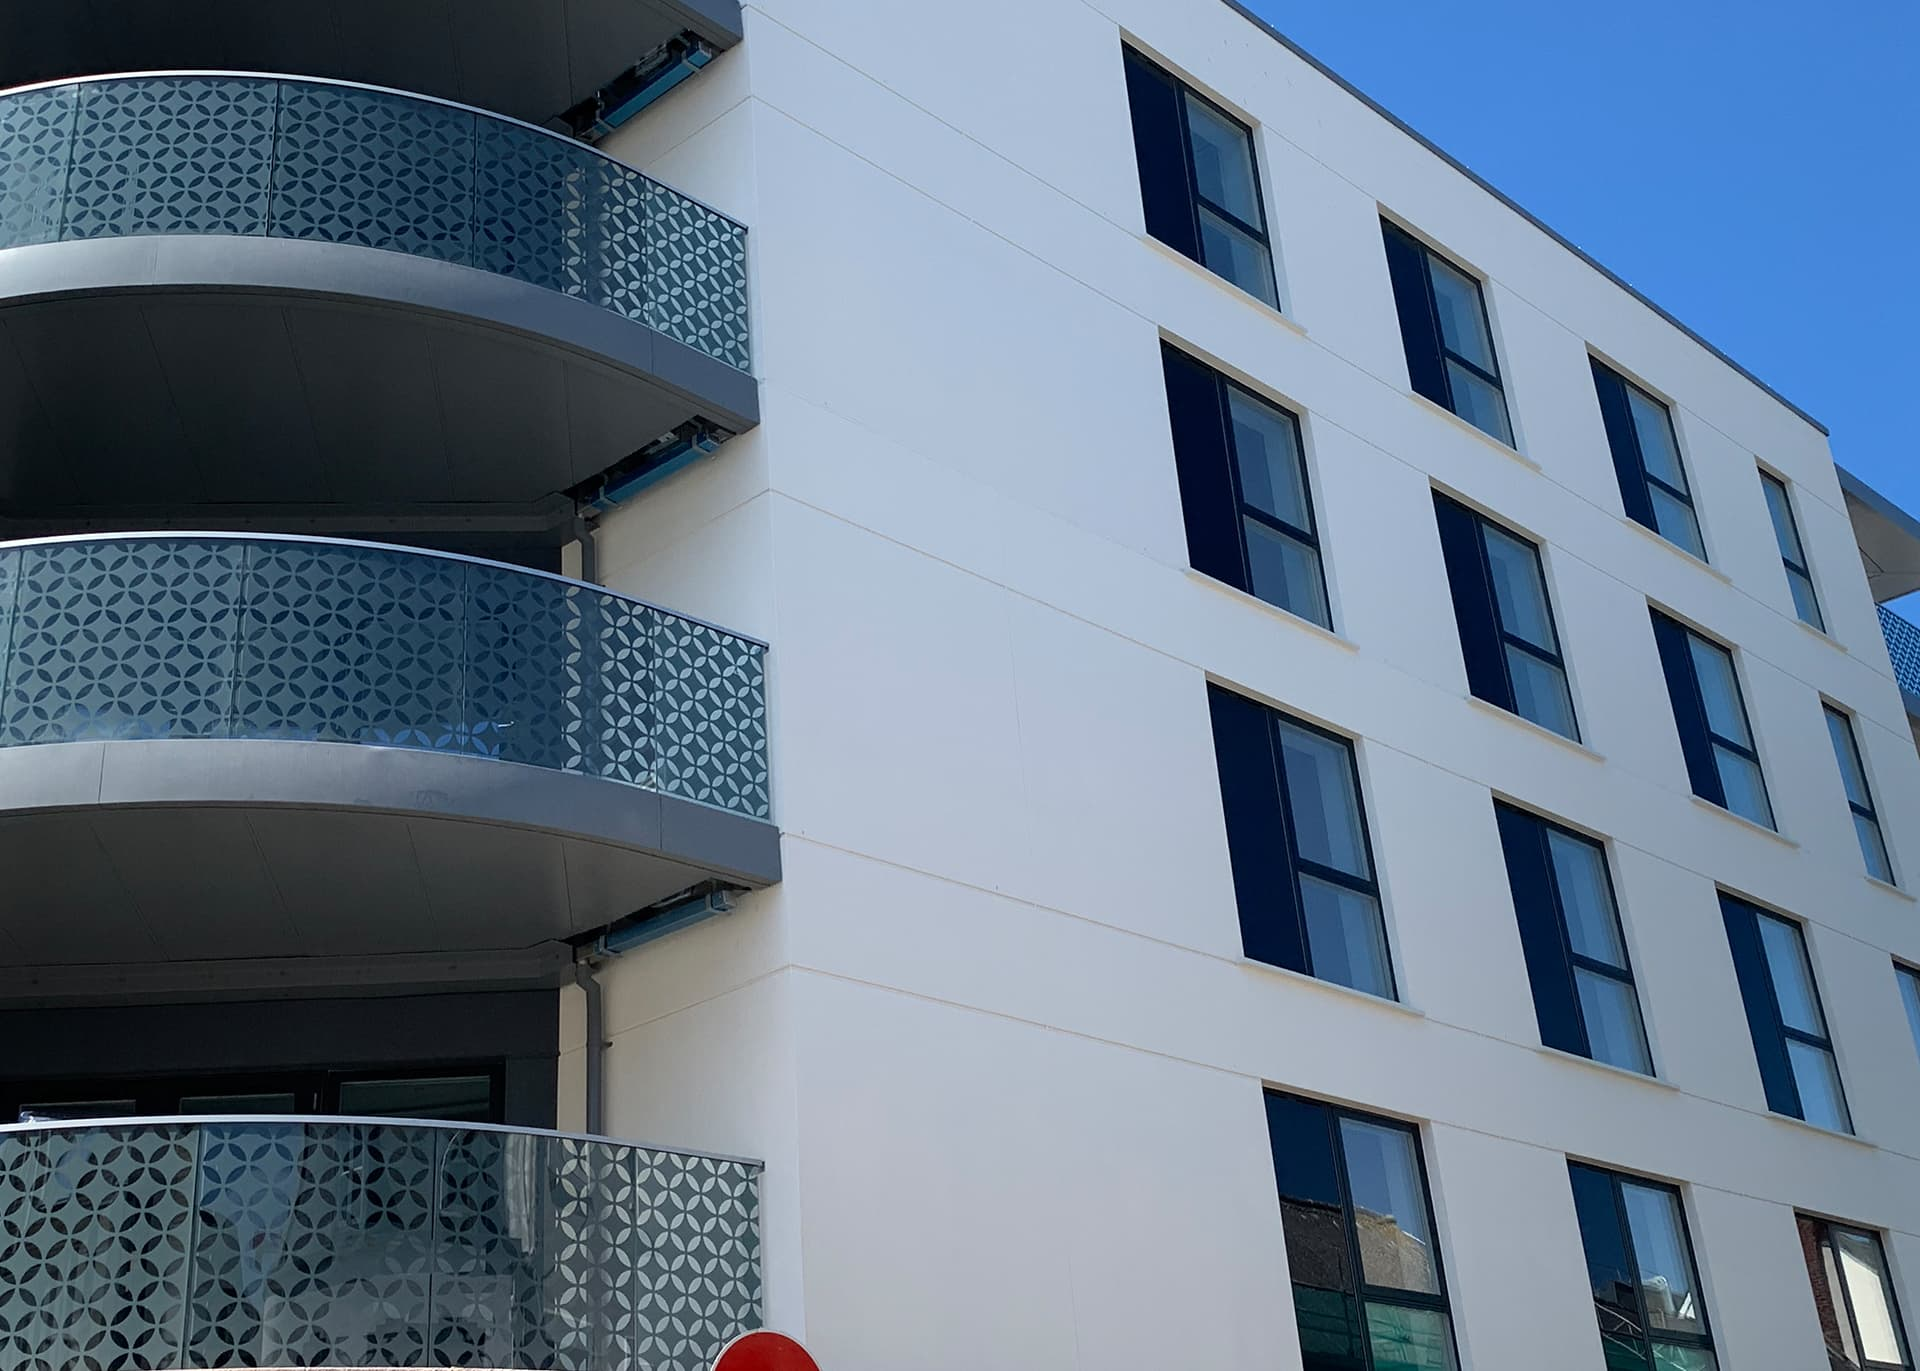 Exterior Hilary Street apartments St Helier